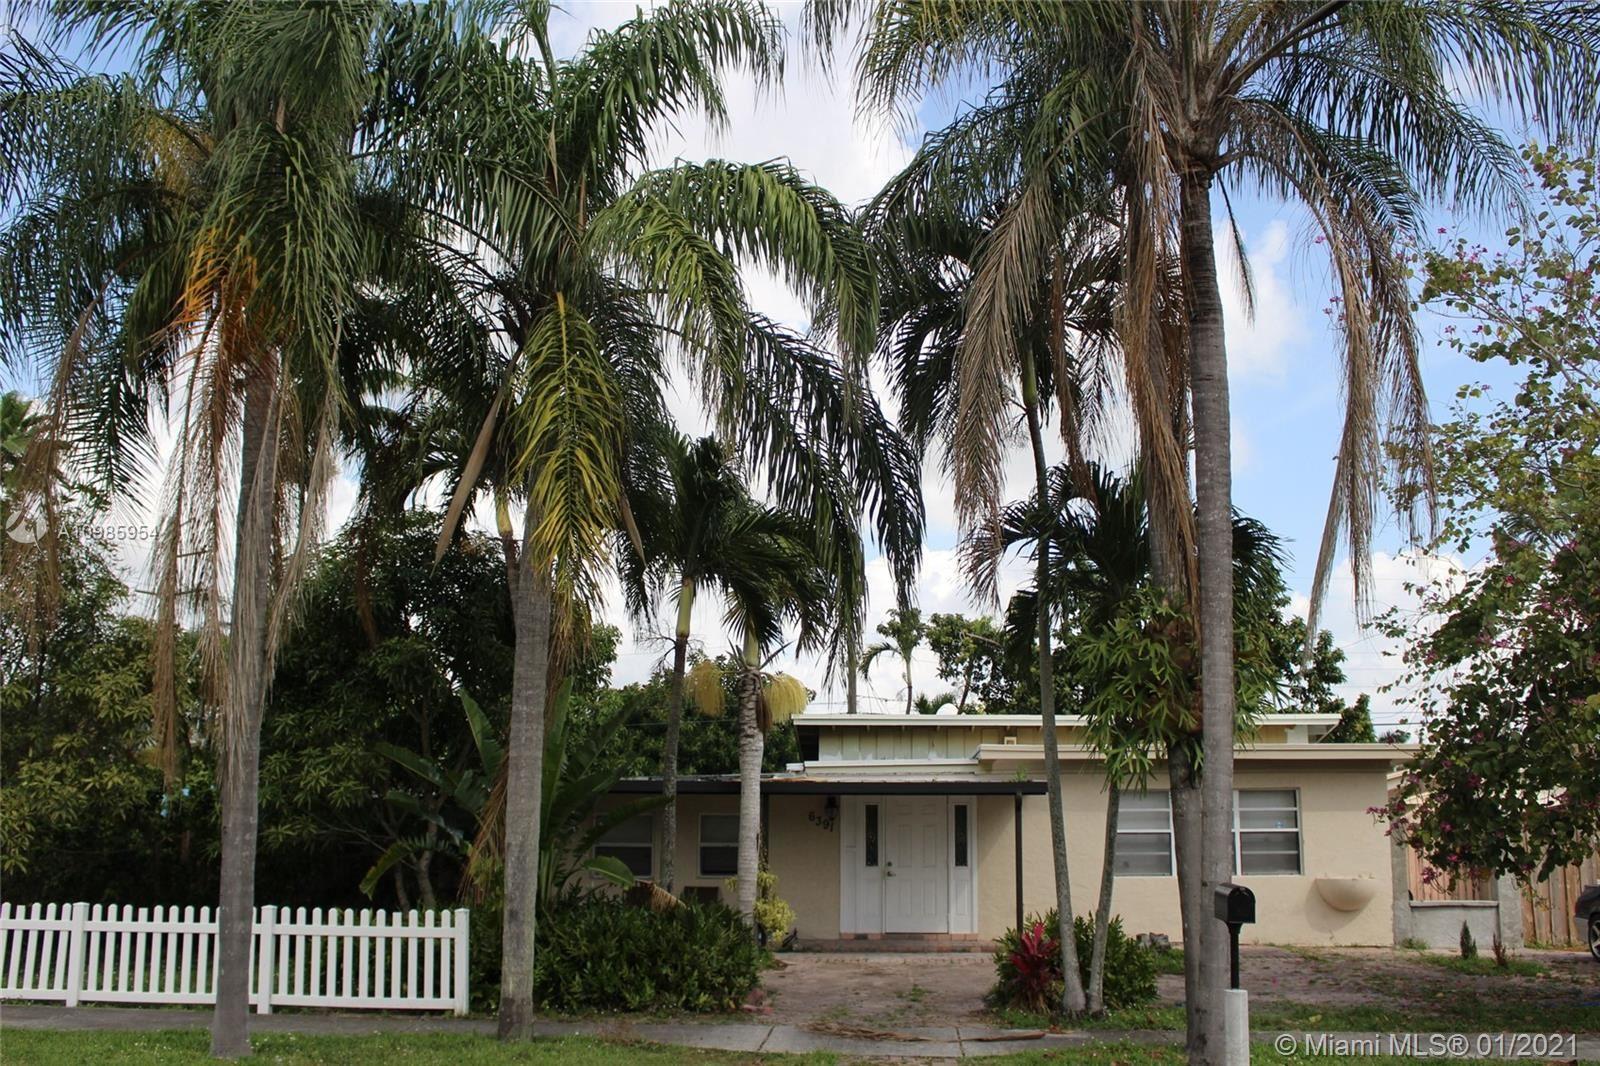 6391 Rodman St, Hollywood, FL 33023 - #: A10985954